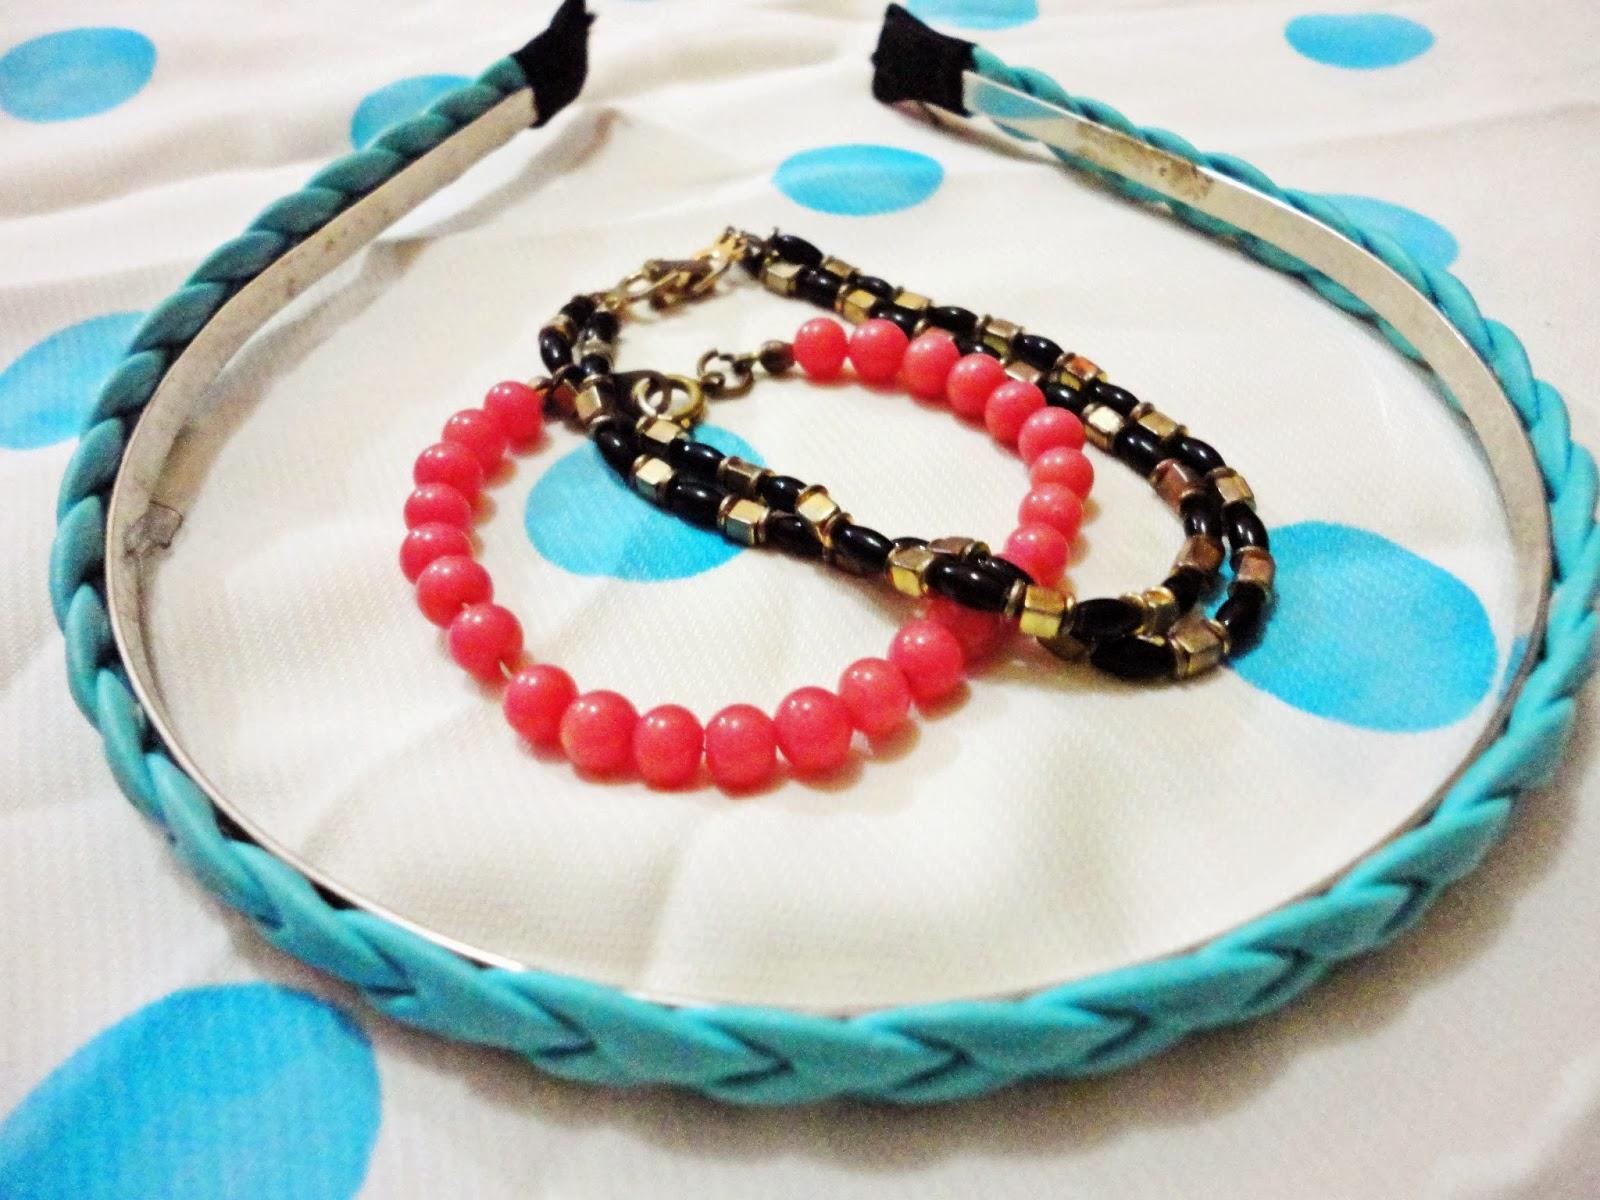 headband and bracelets